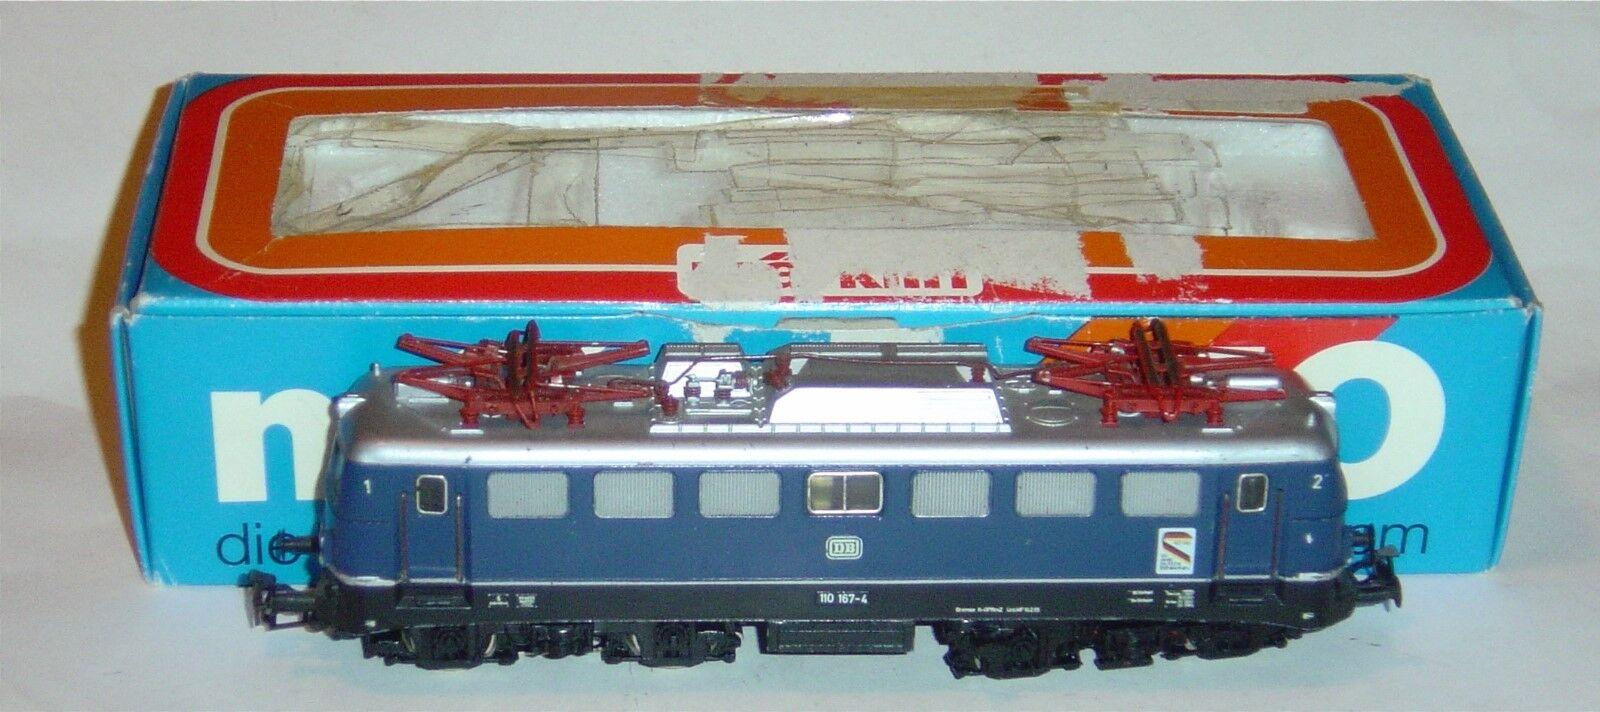 Marklin ho, e110 electric locomotive 167-4 DB ref 3039, optional digital